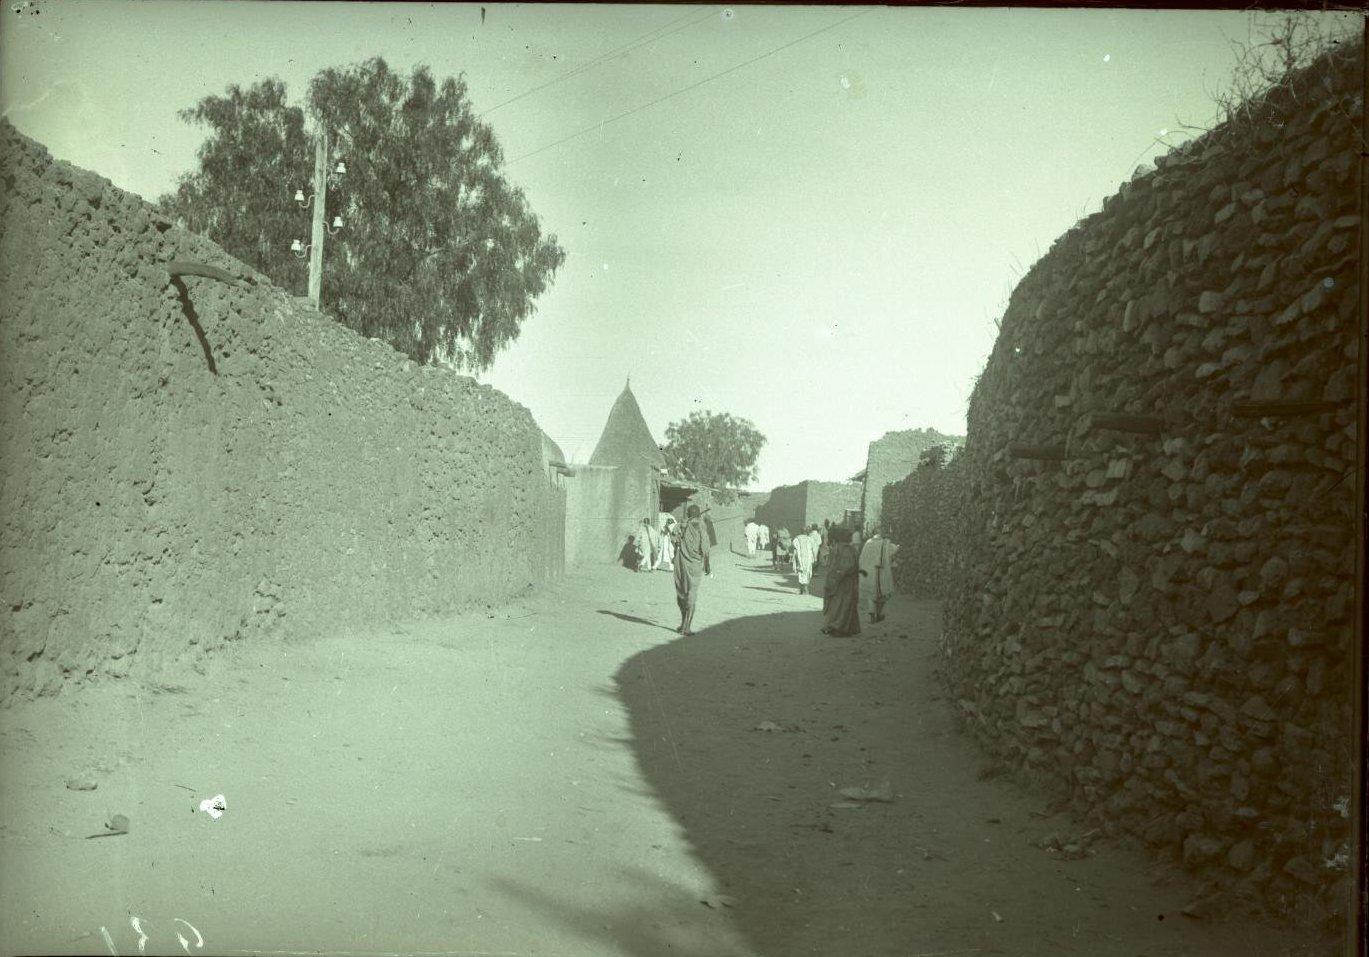 231. Абиссиния, провинция Харар, г. Харар. Улица